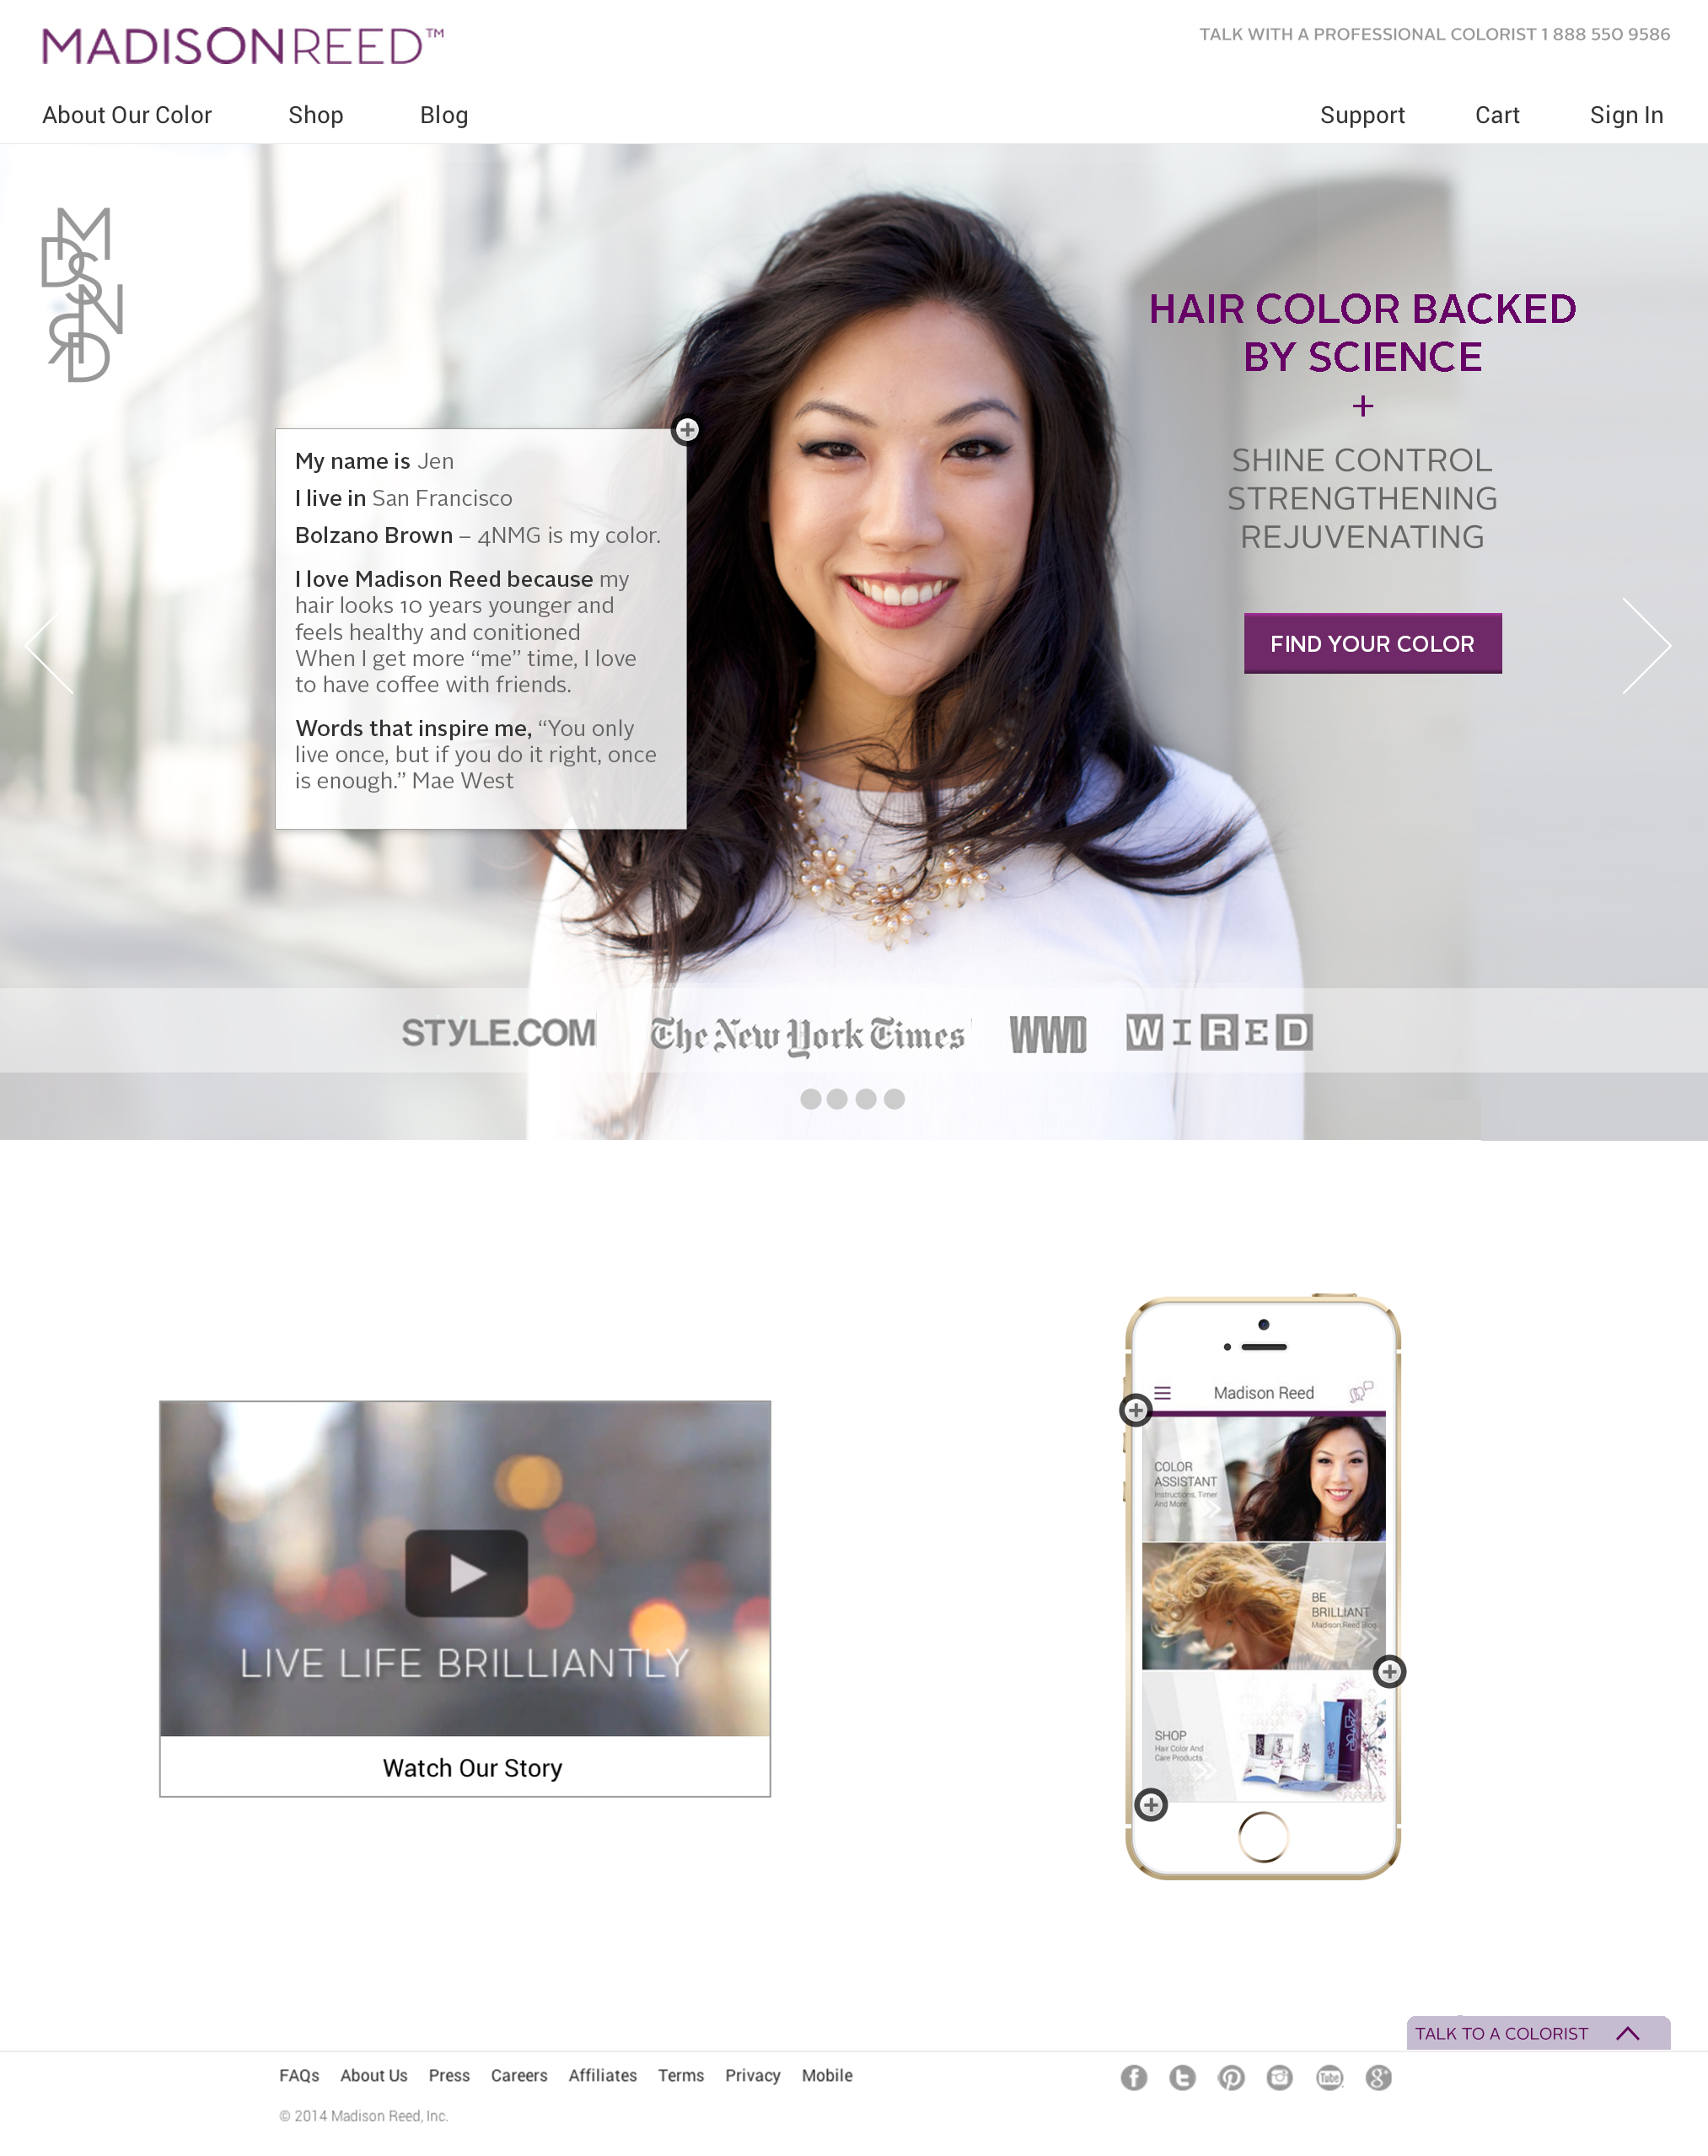 MR-Website_Redesign-01-2014_8.jpg